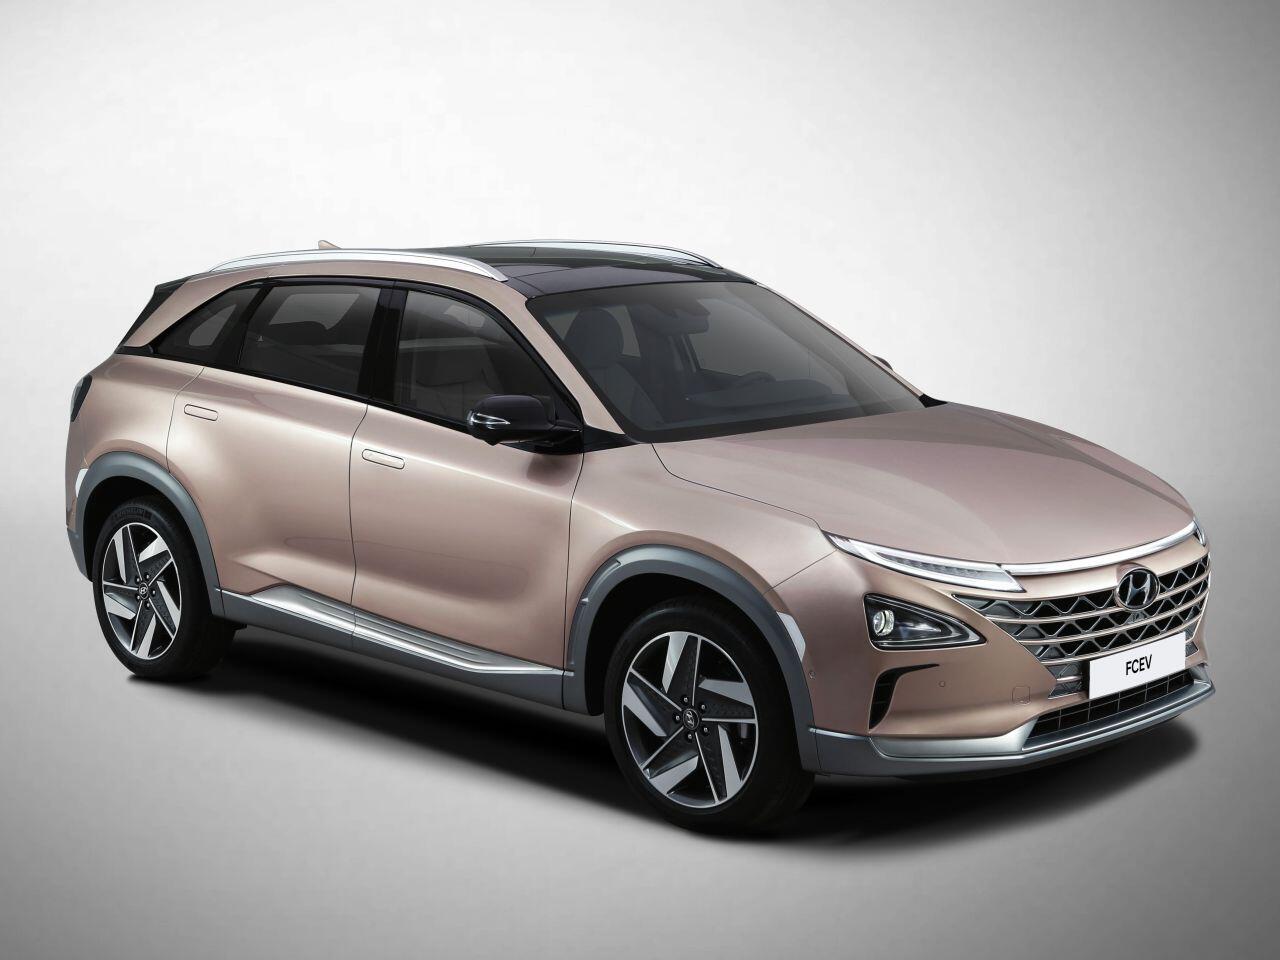 Bild zu Hyundai Next-Generation FCEV